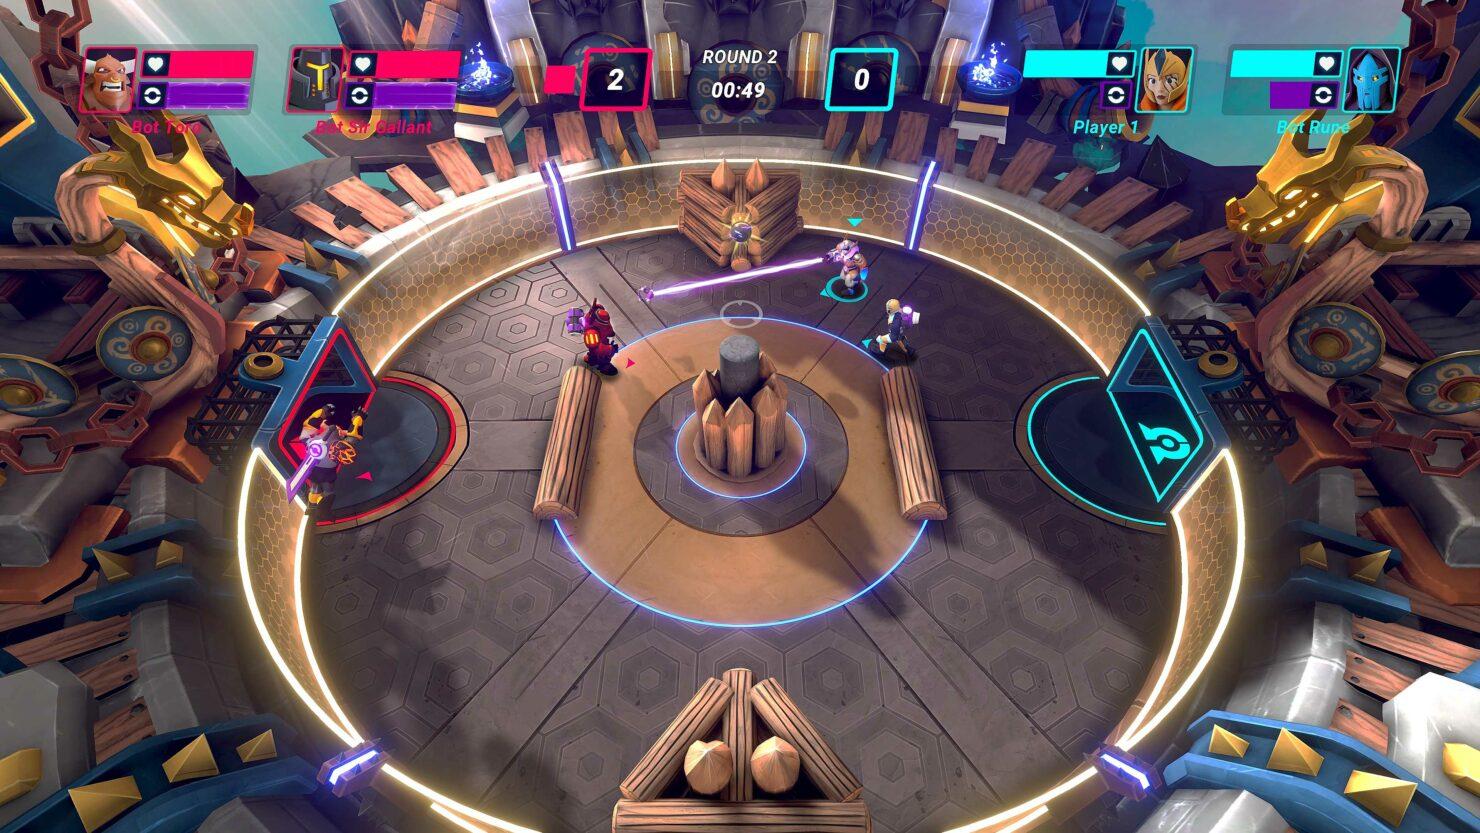 hyperbrawl-tournament-preview-04-part-2